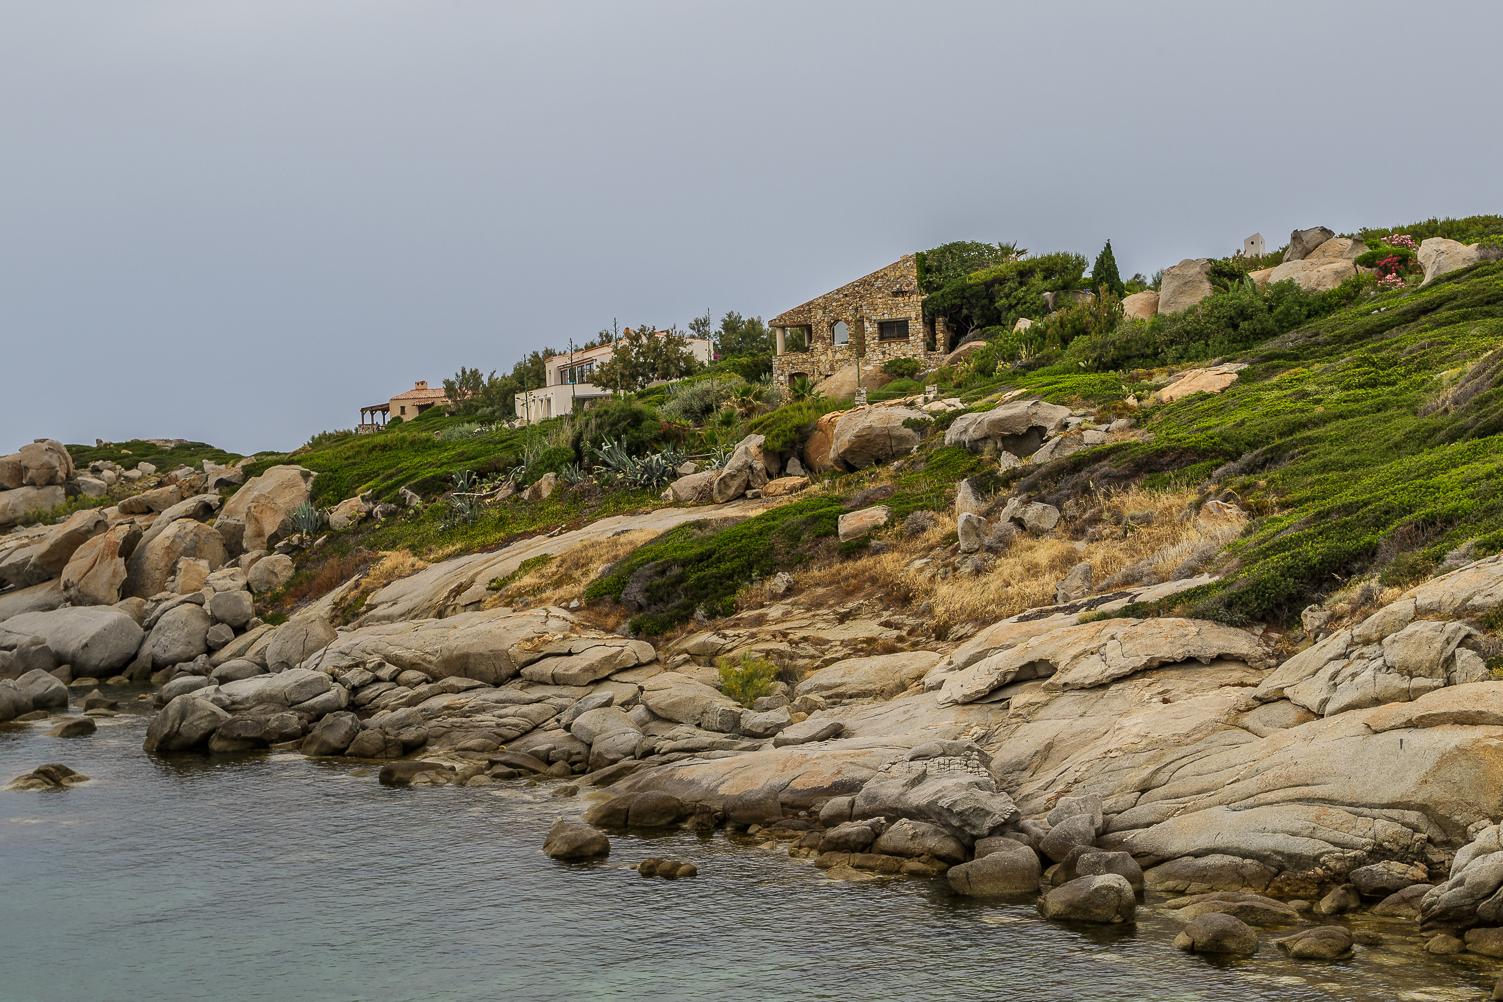 Ferienhaus-Calvi-Korsika